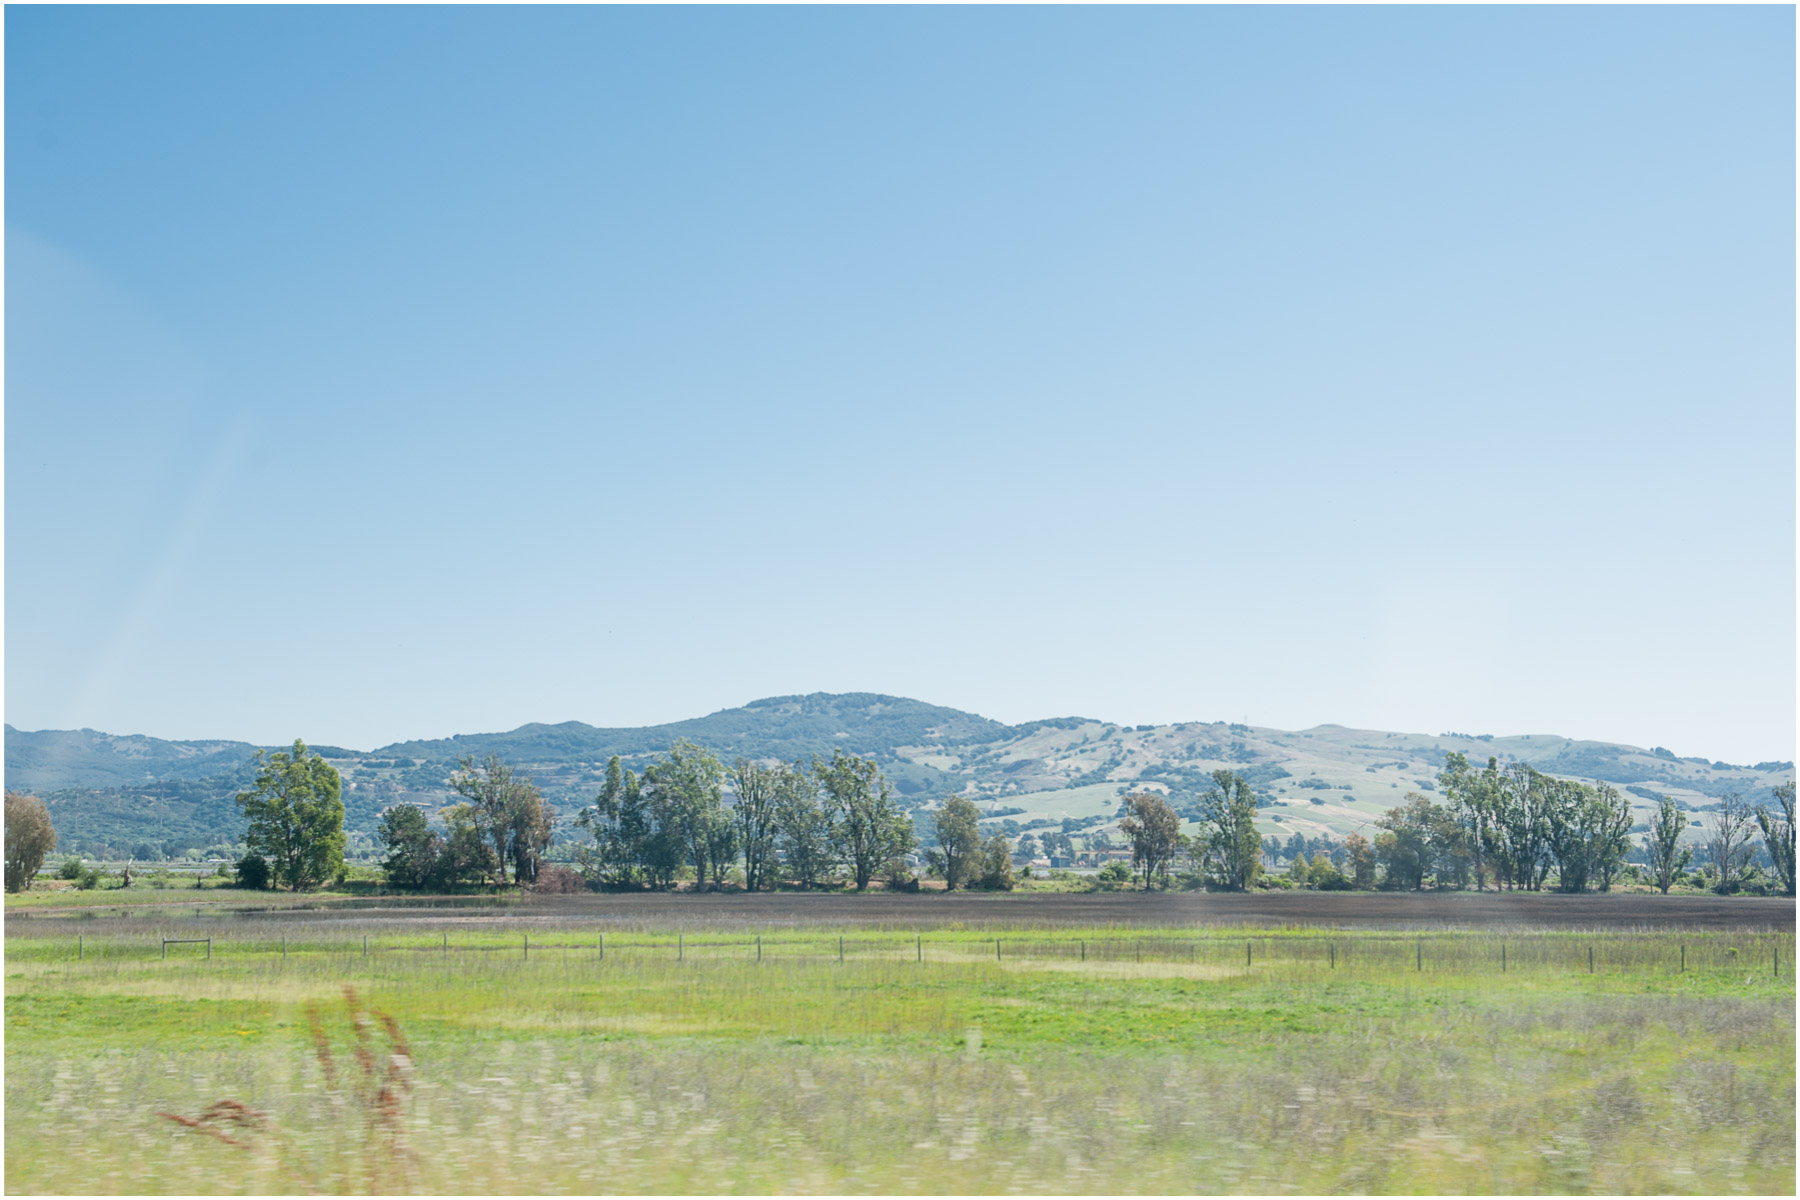 Luna-Vineyards-California-Napa-Valley_1.jpg